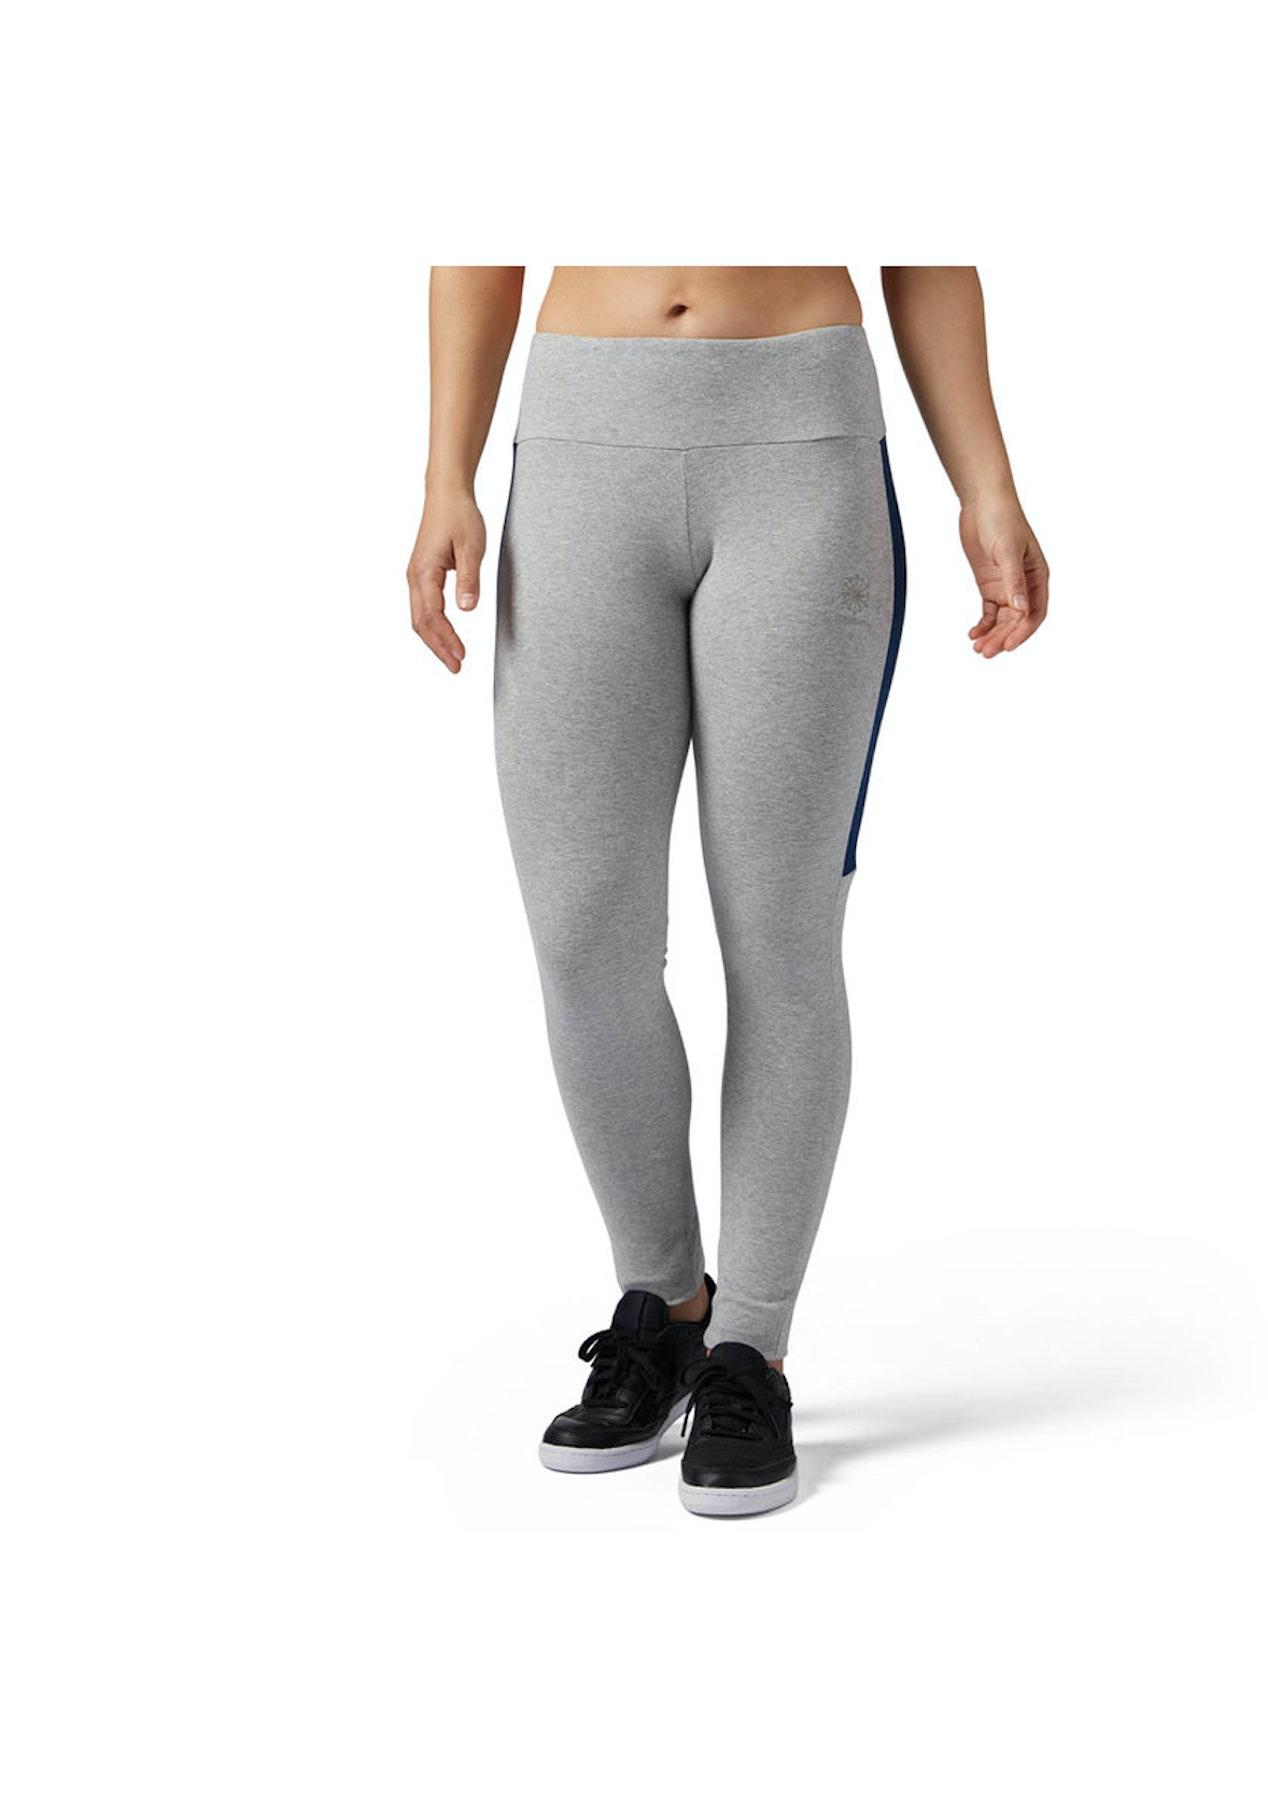 2e3e034ad13ff8 Reebok Womens - Classics Franchise Legging Grey - Womens Garage Sale -  Onceit